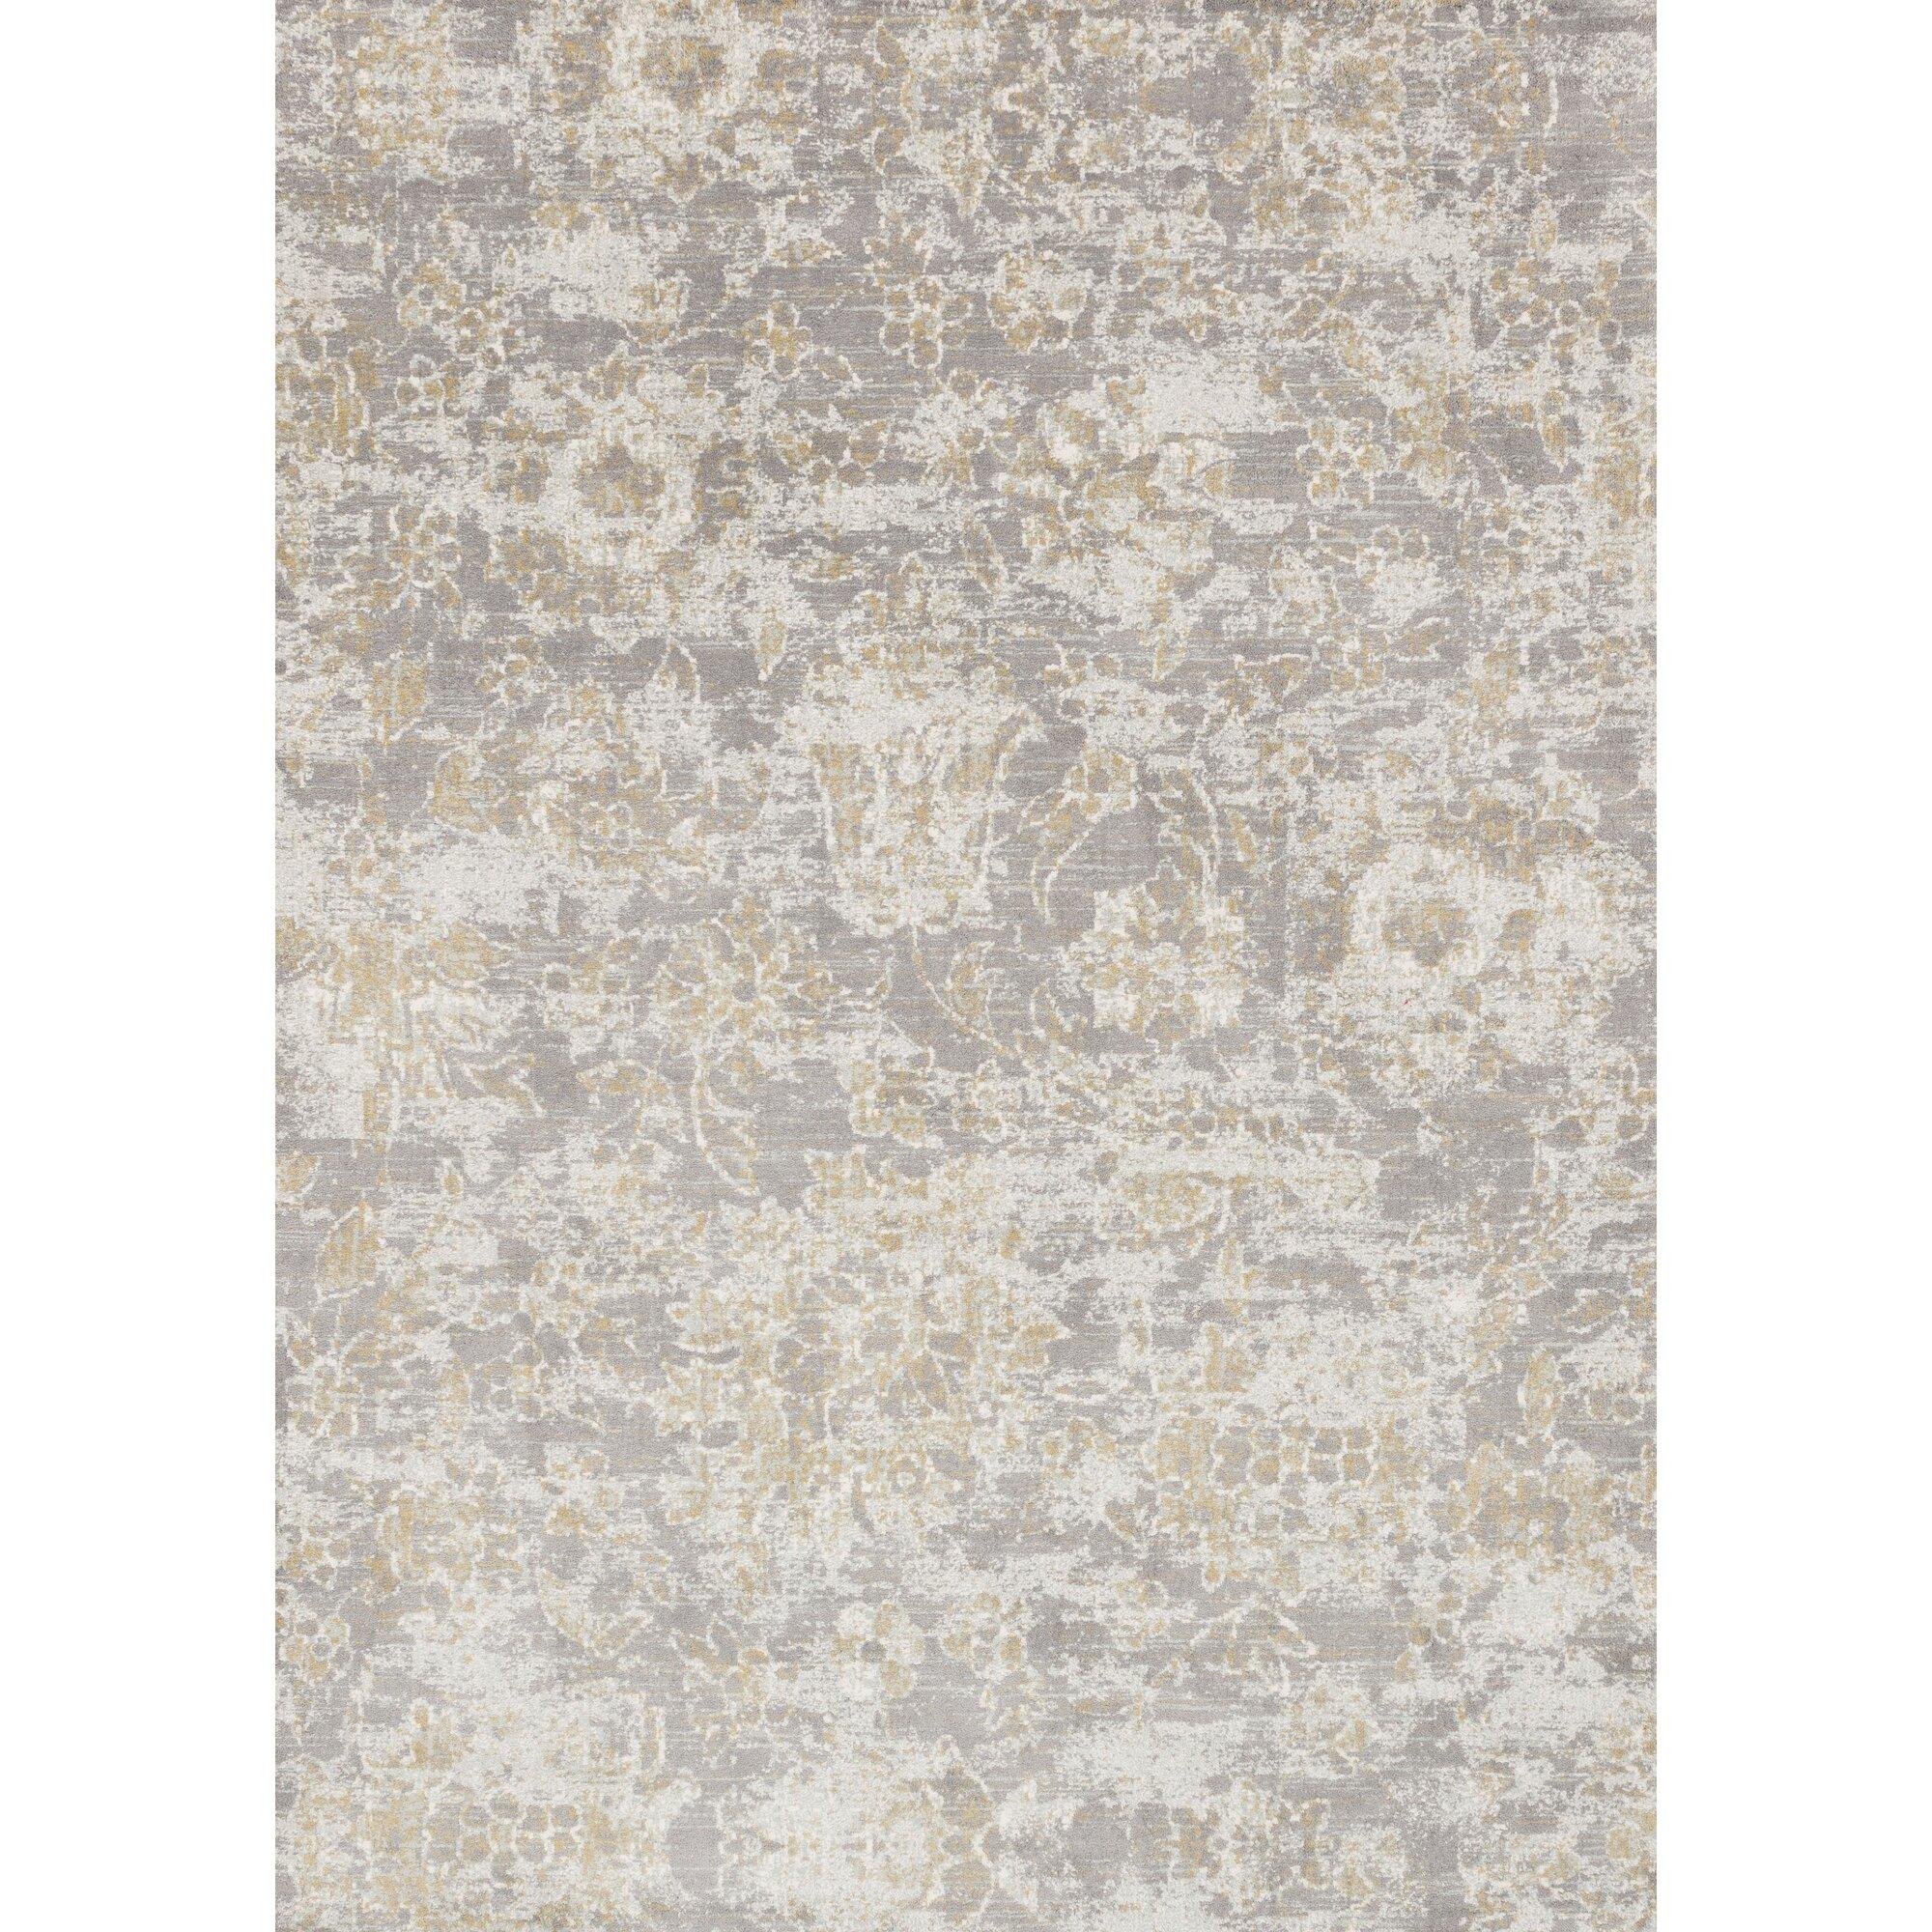 Loloi Rugs Torrance Gray/White/Tan Area Rug & Reviews ...